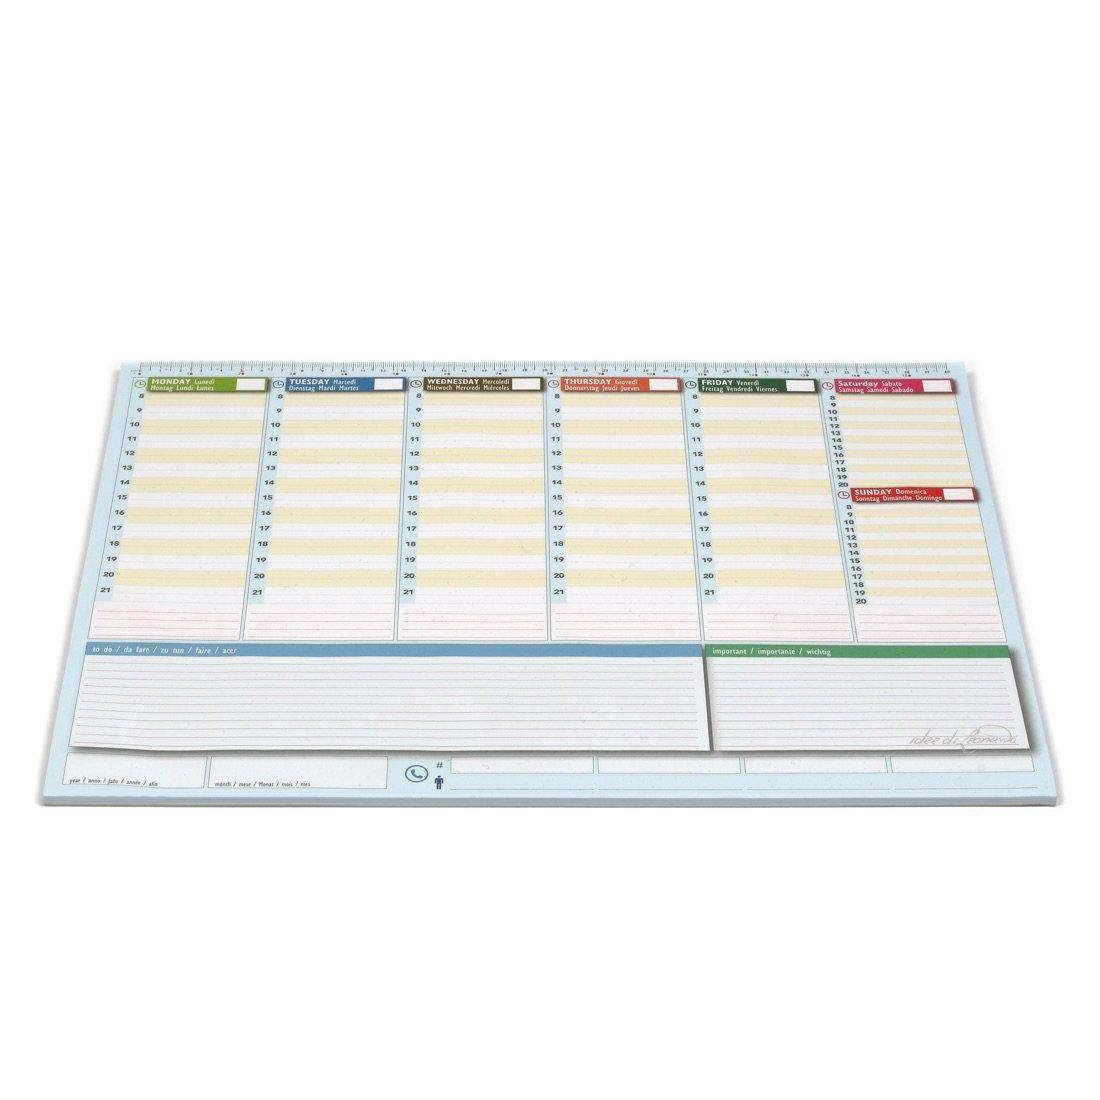 Planificador semanal de escritorio 42 x 30 – Agenda Agenda de mesa perpetua – World Planner